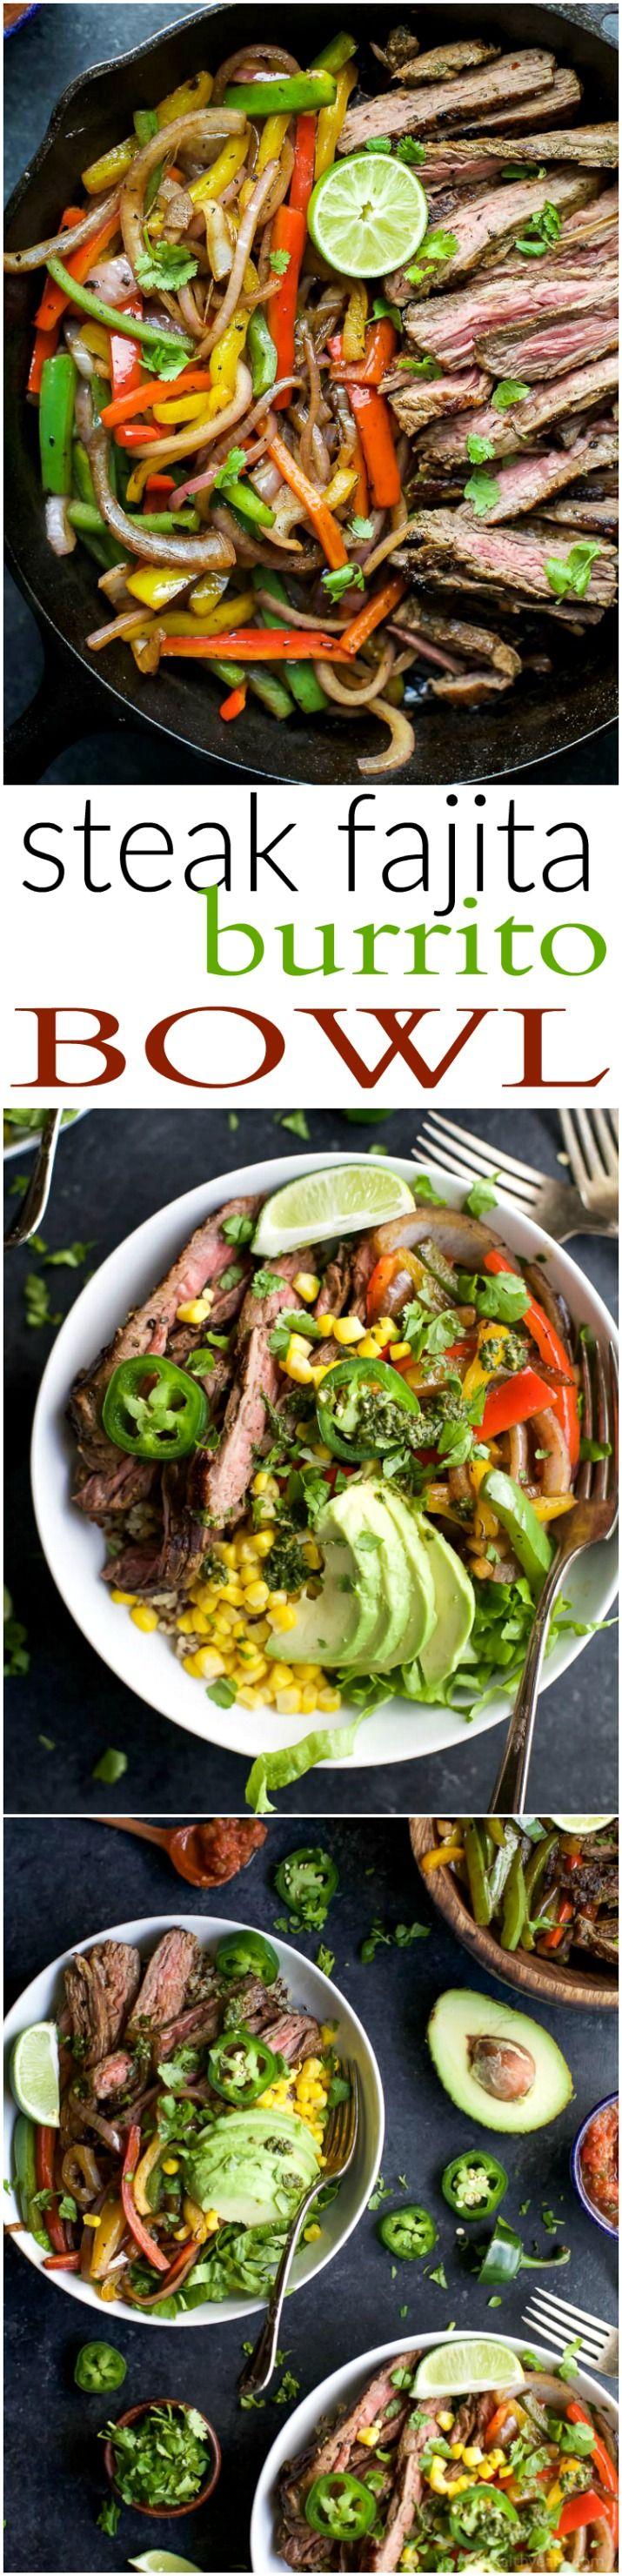 Homemade STEAK FAJITA BURRITO BOWLS filled with quinoa, fajita steak, avocado and a cilantro lime chimichurri sauce you'll adore. This quick Burrito Bowl is done in 30 minutes and is sure to be a favorite! | joyfulhealthyeats.com | Gluten Free Recipes